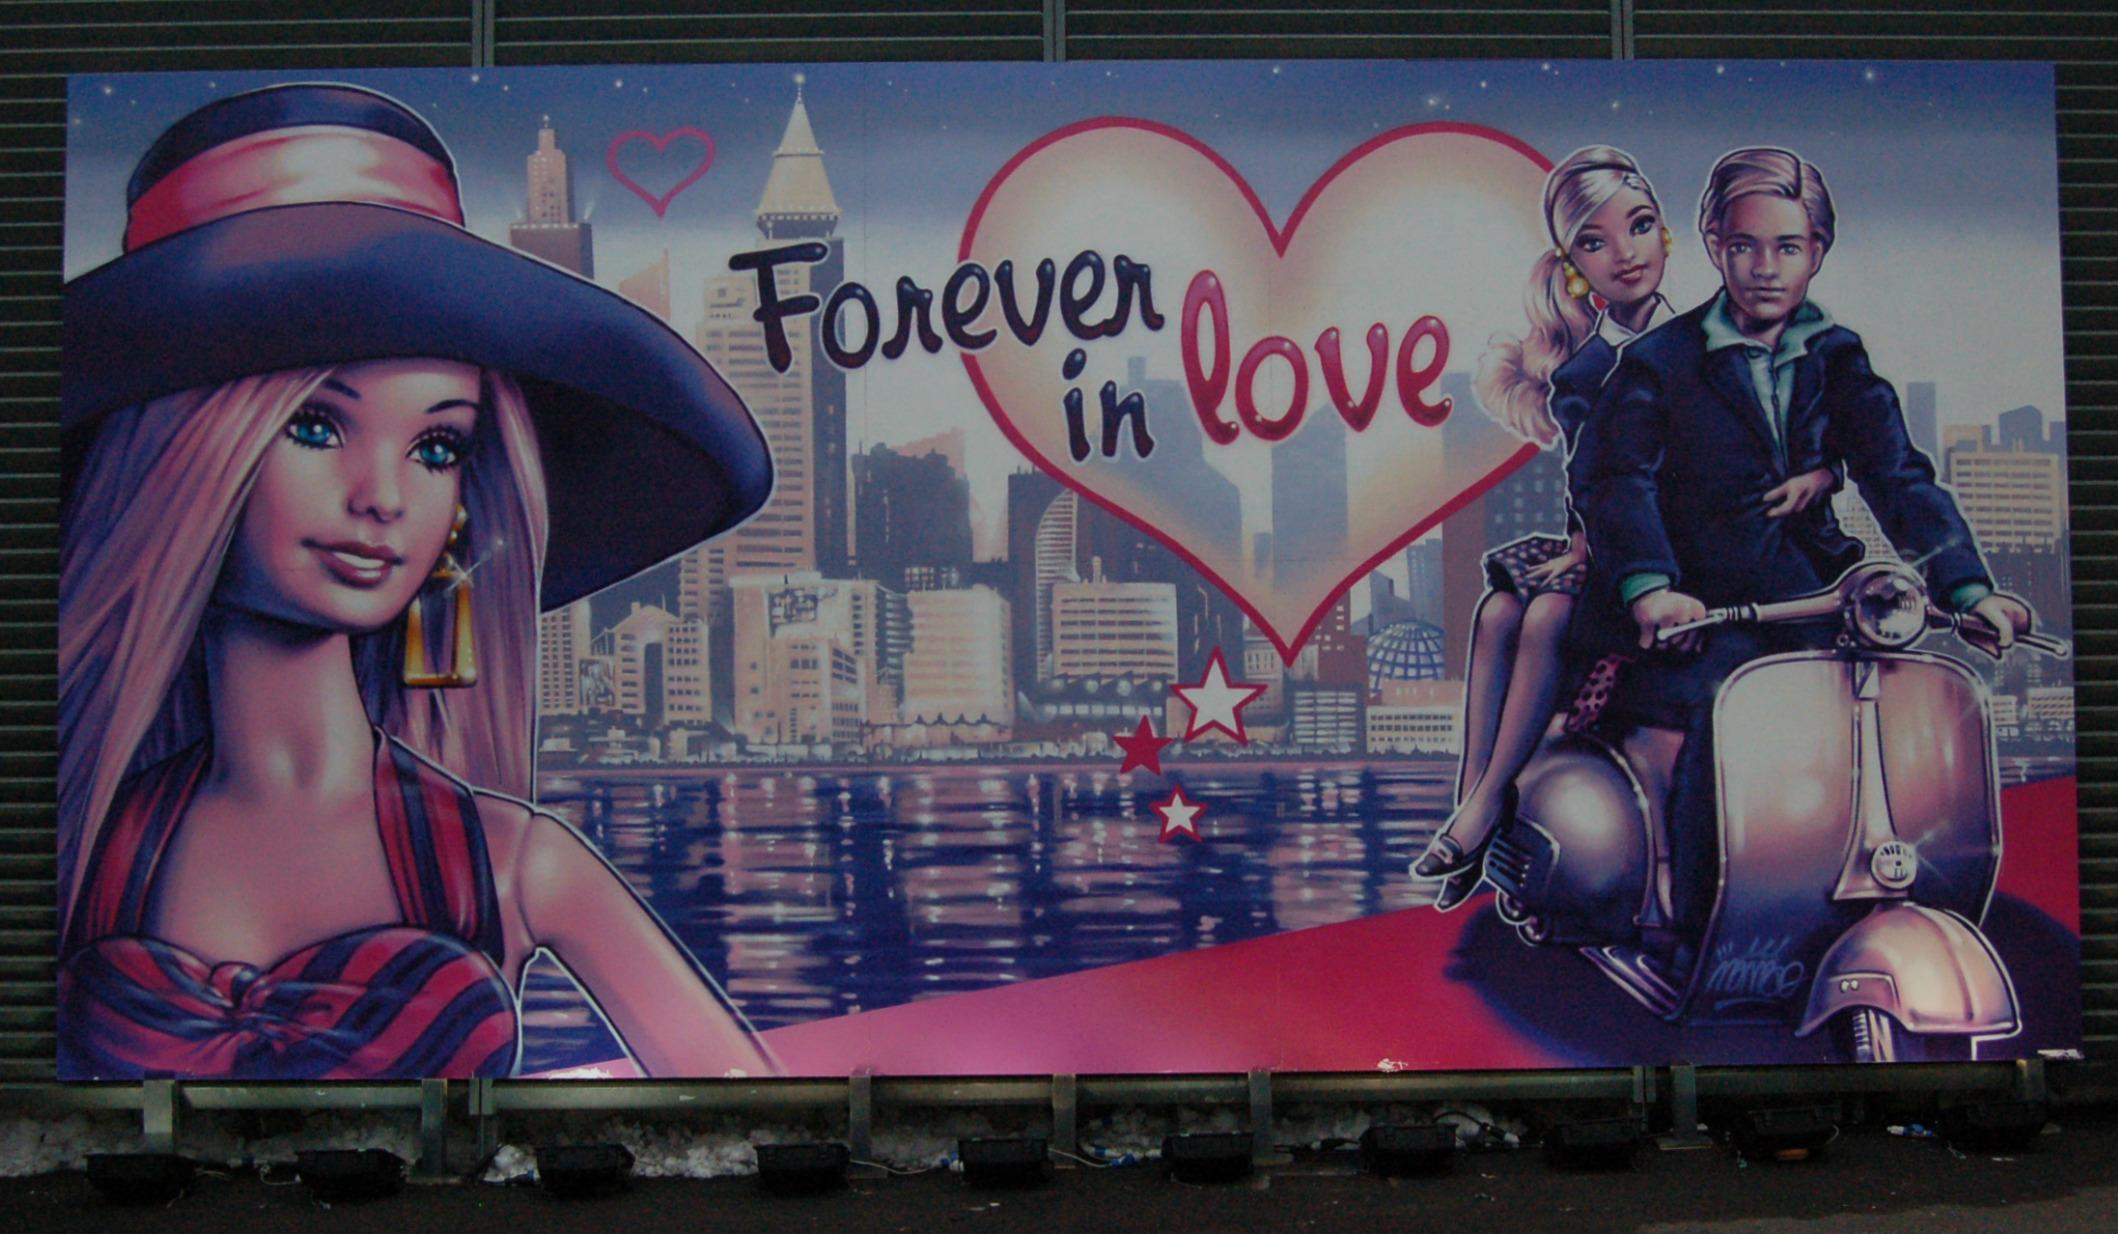 2013-02-14-foreverinlove.jpeg